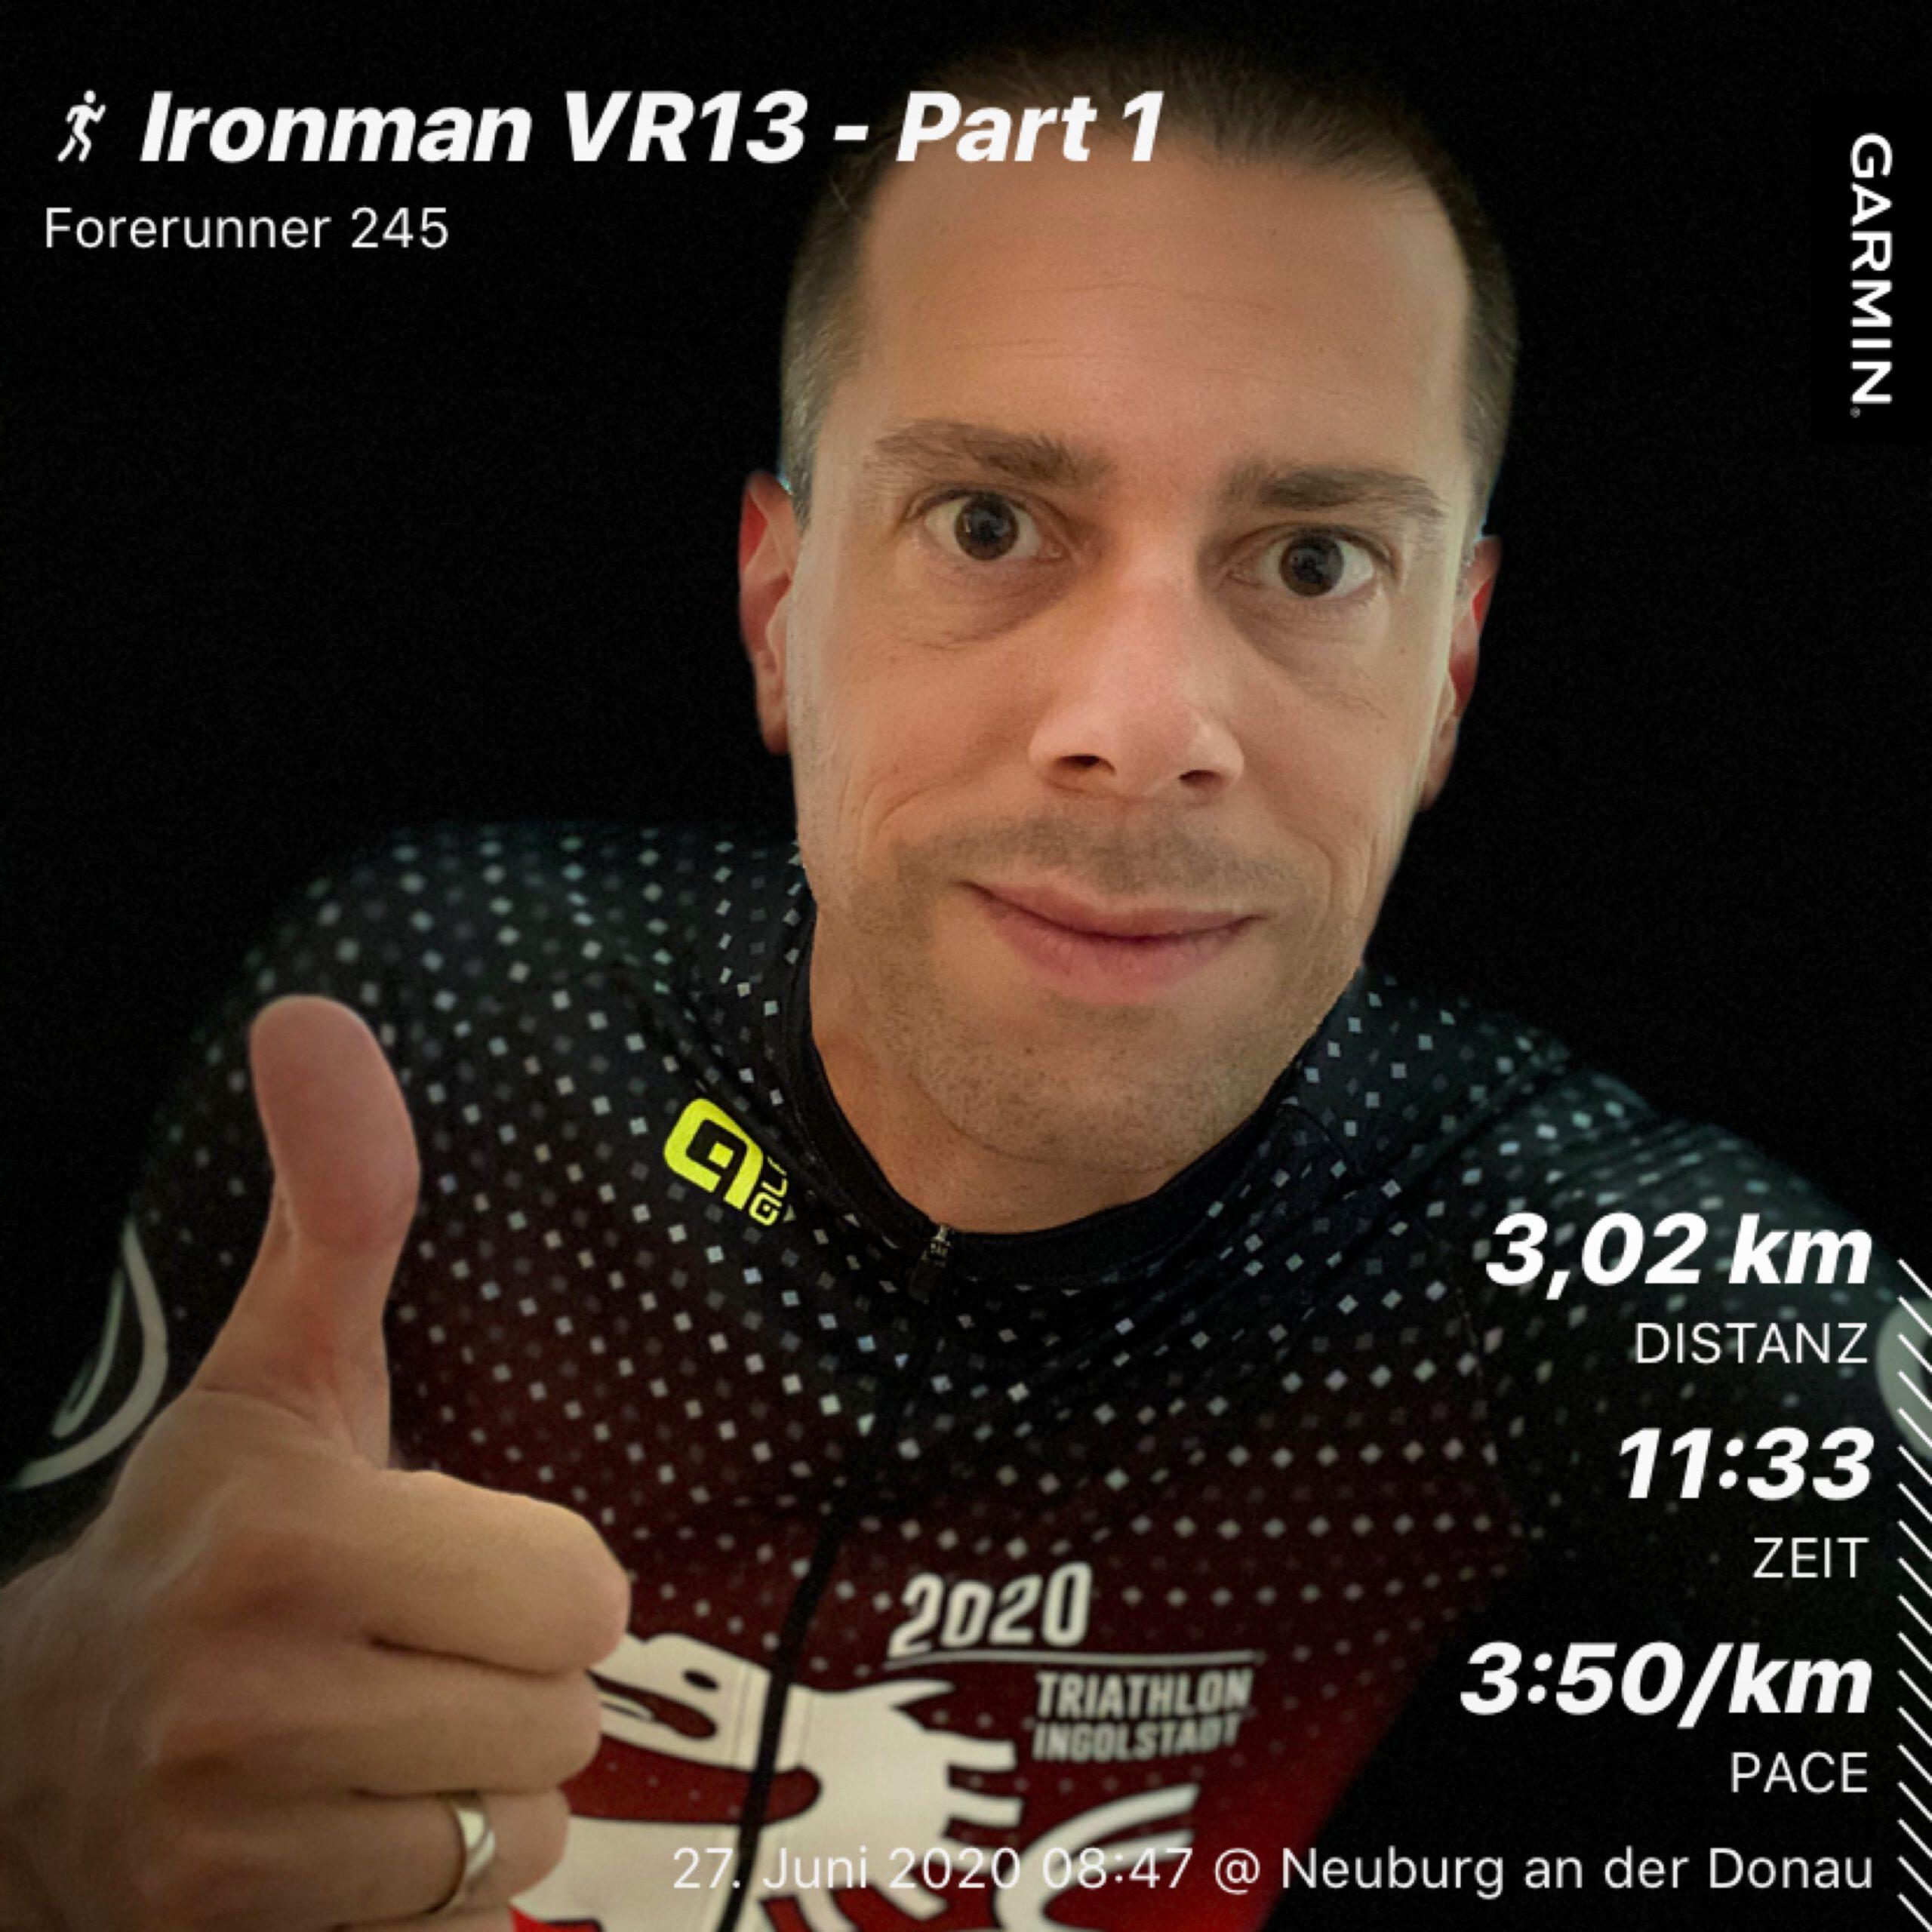 Ironman VR13